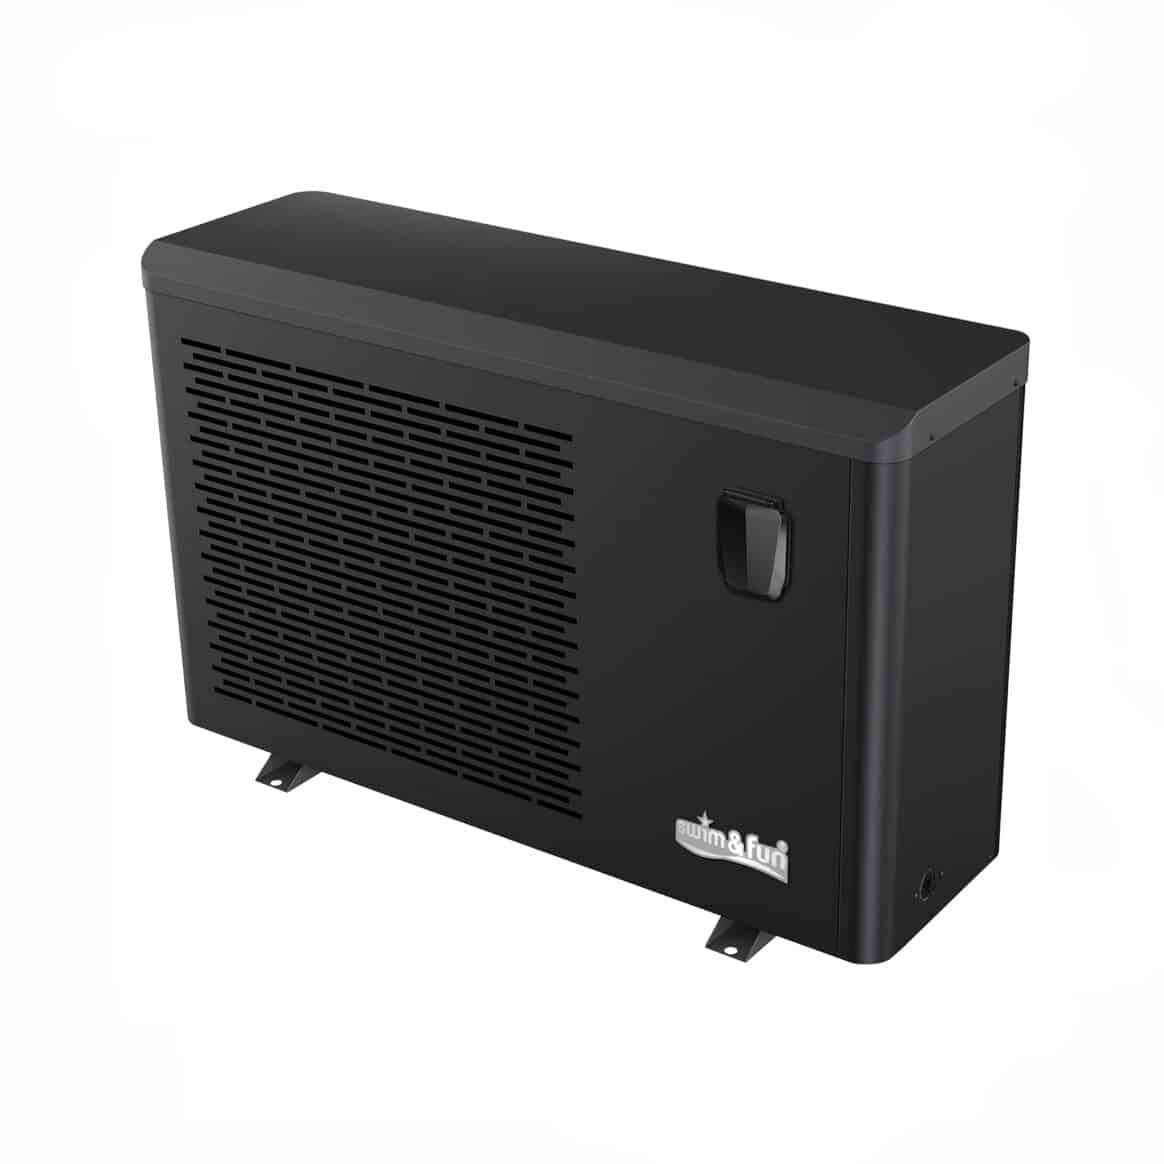 HeatBooster Pro Varmepumpe med WiFi 13.5 KW